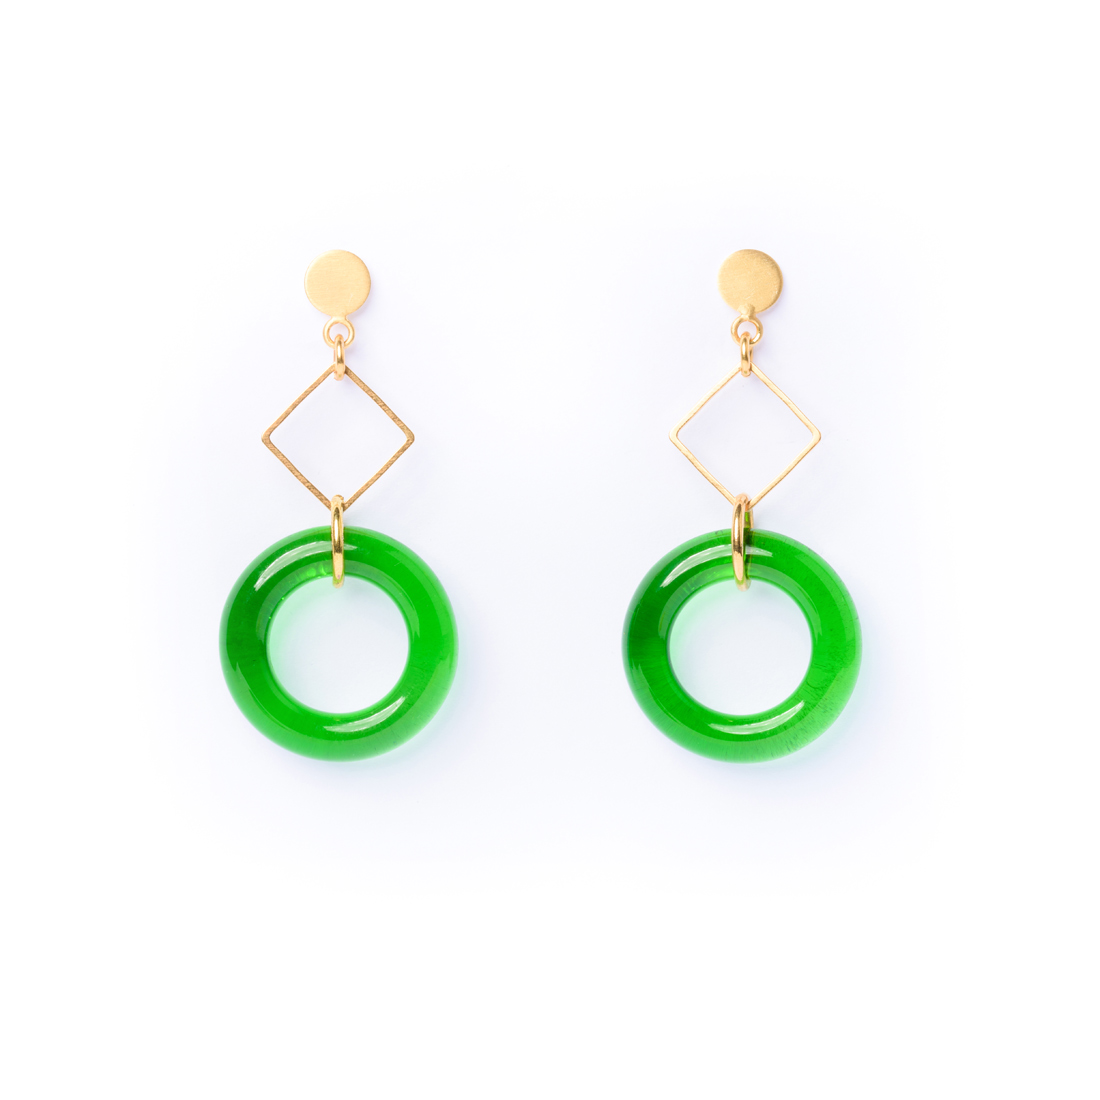 Attractive earrings